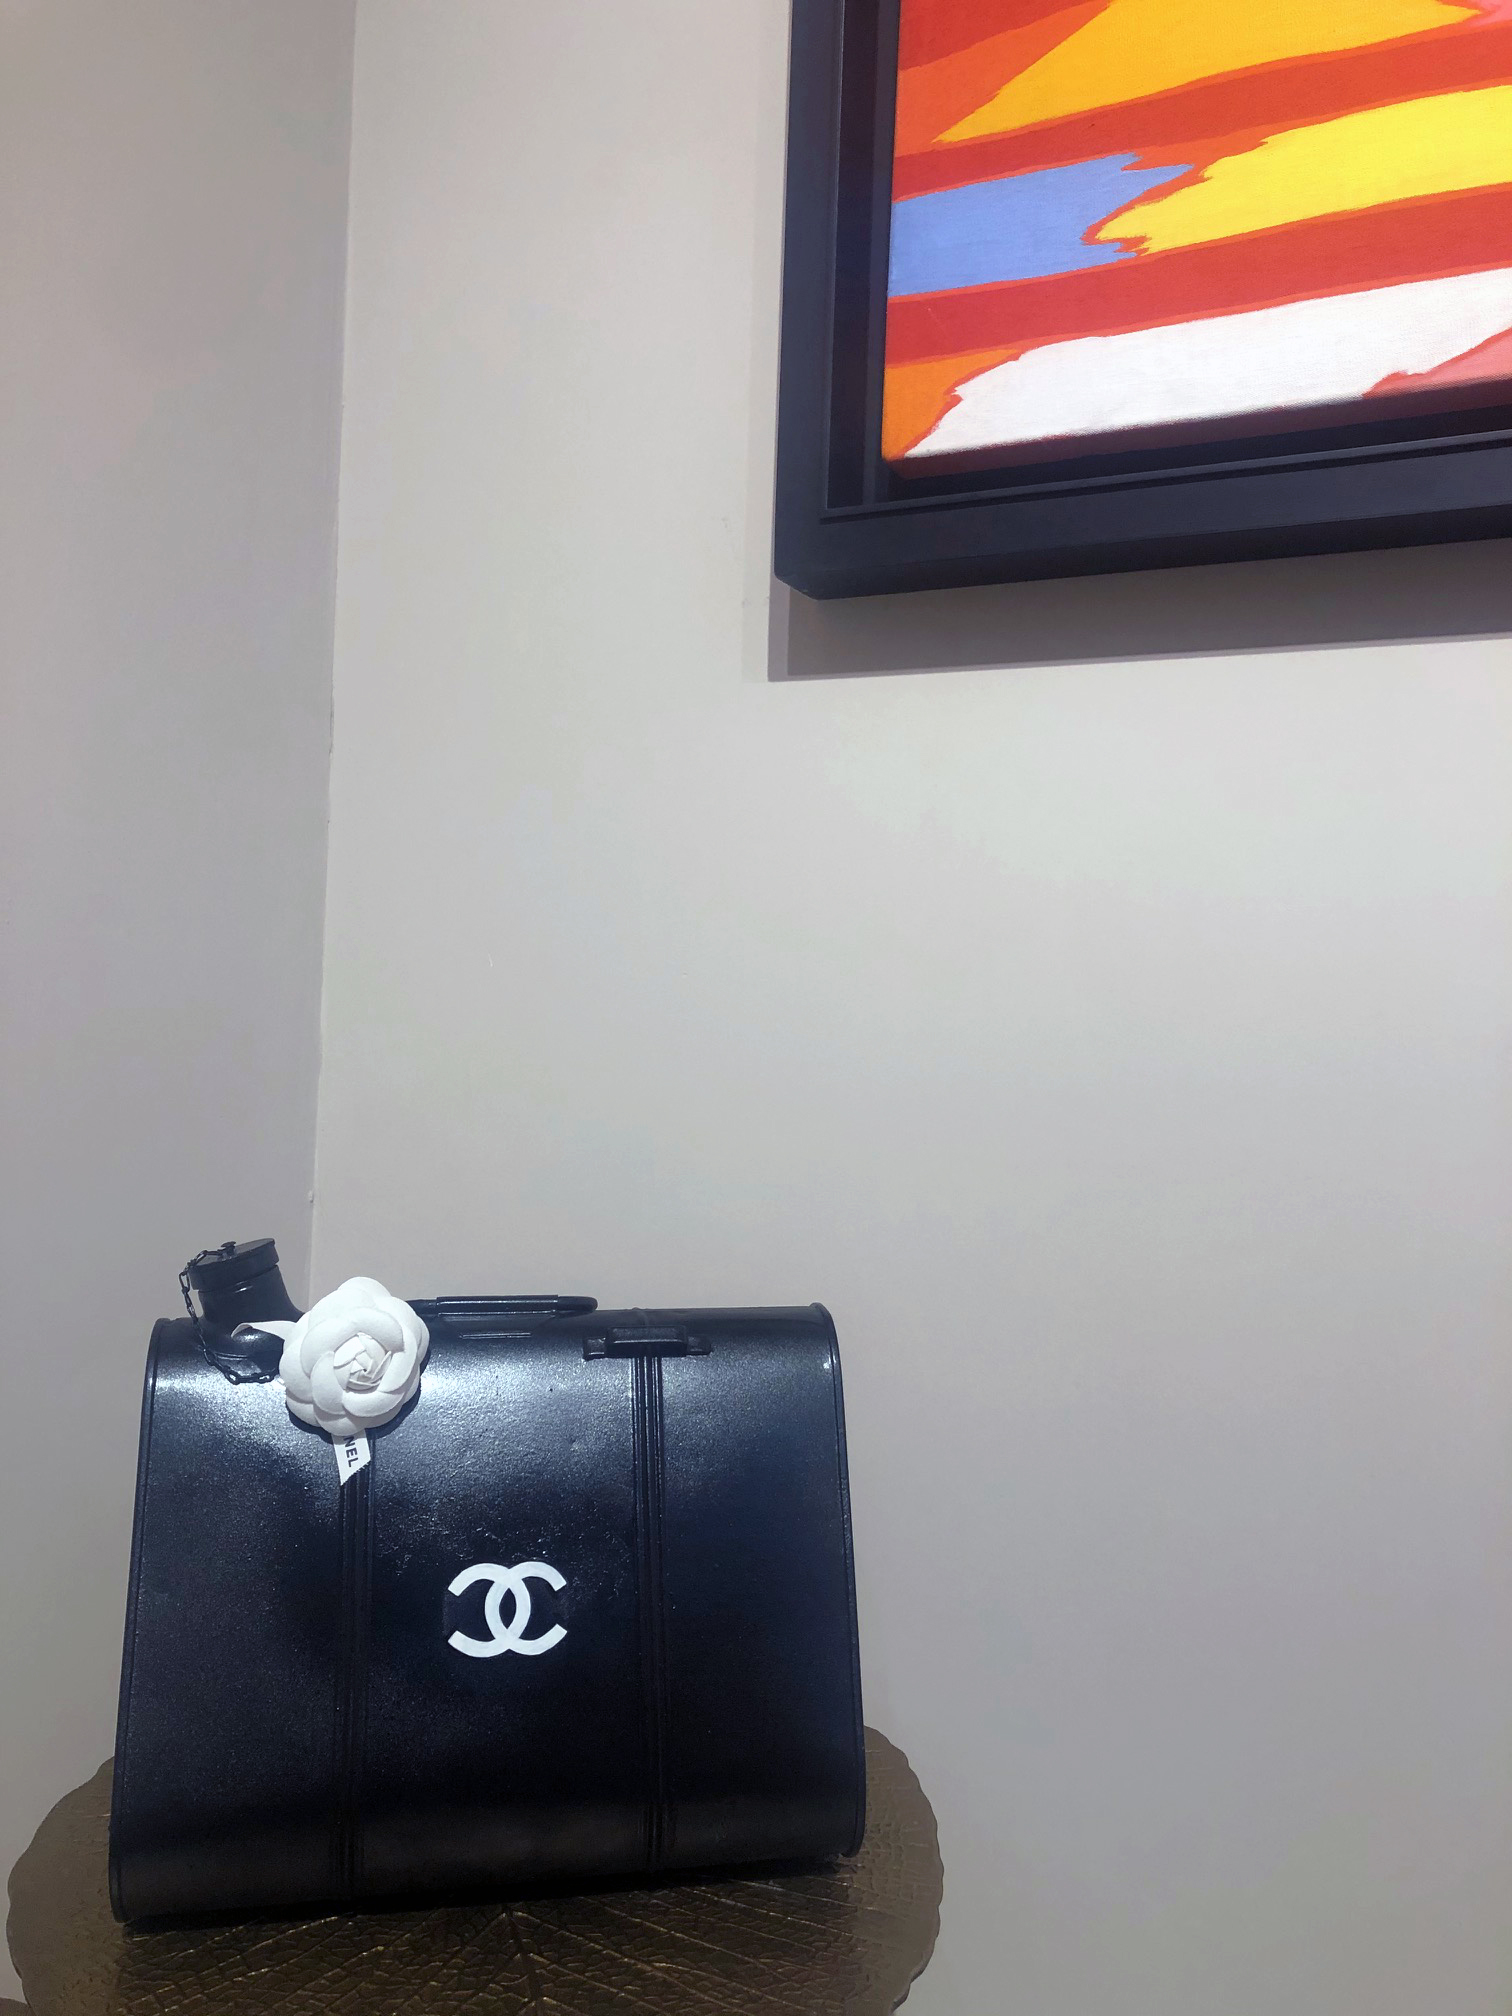 Tank Bag Chanel Black, 2019, tecnica mista, 33 x 20 x 26 cm